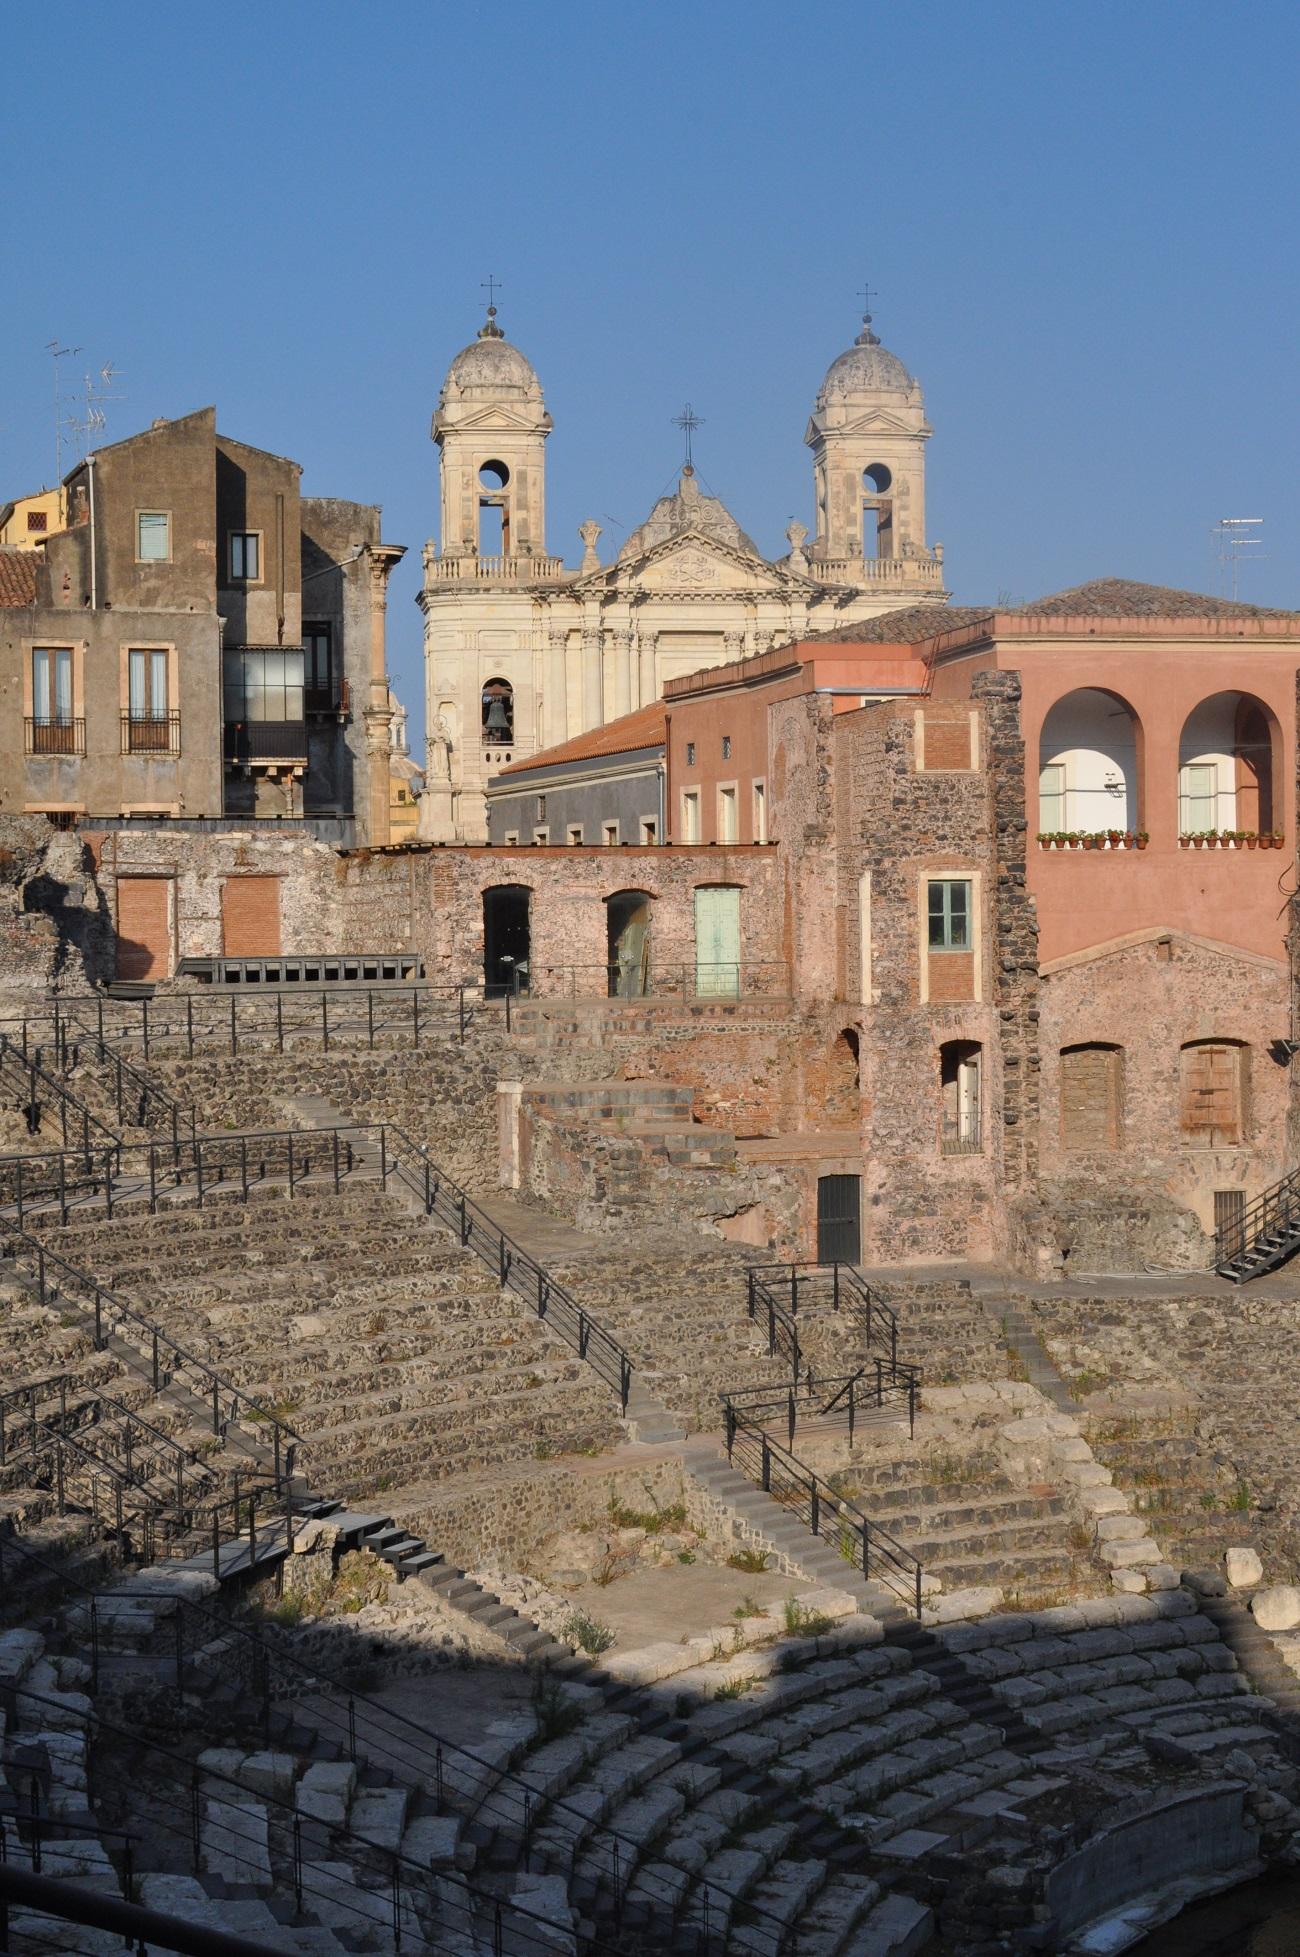 rocaille-blog-catania-sicilia-orientale-tour-70